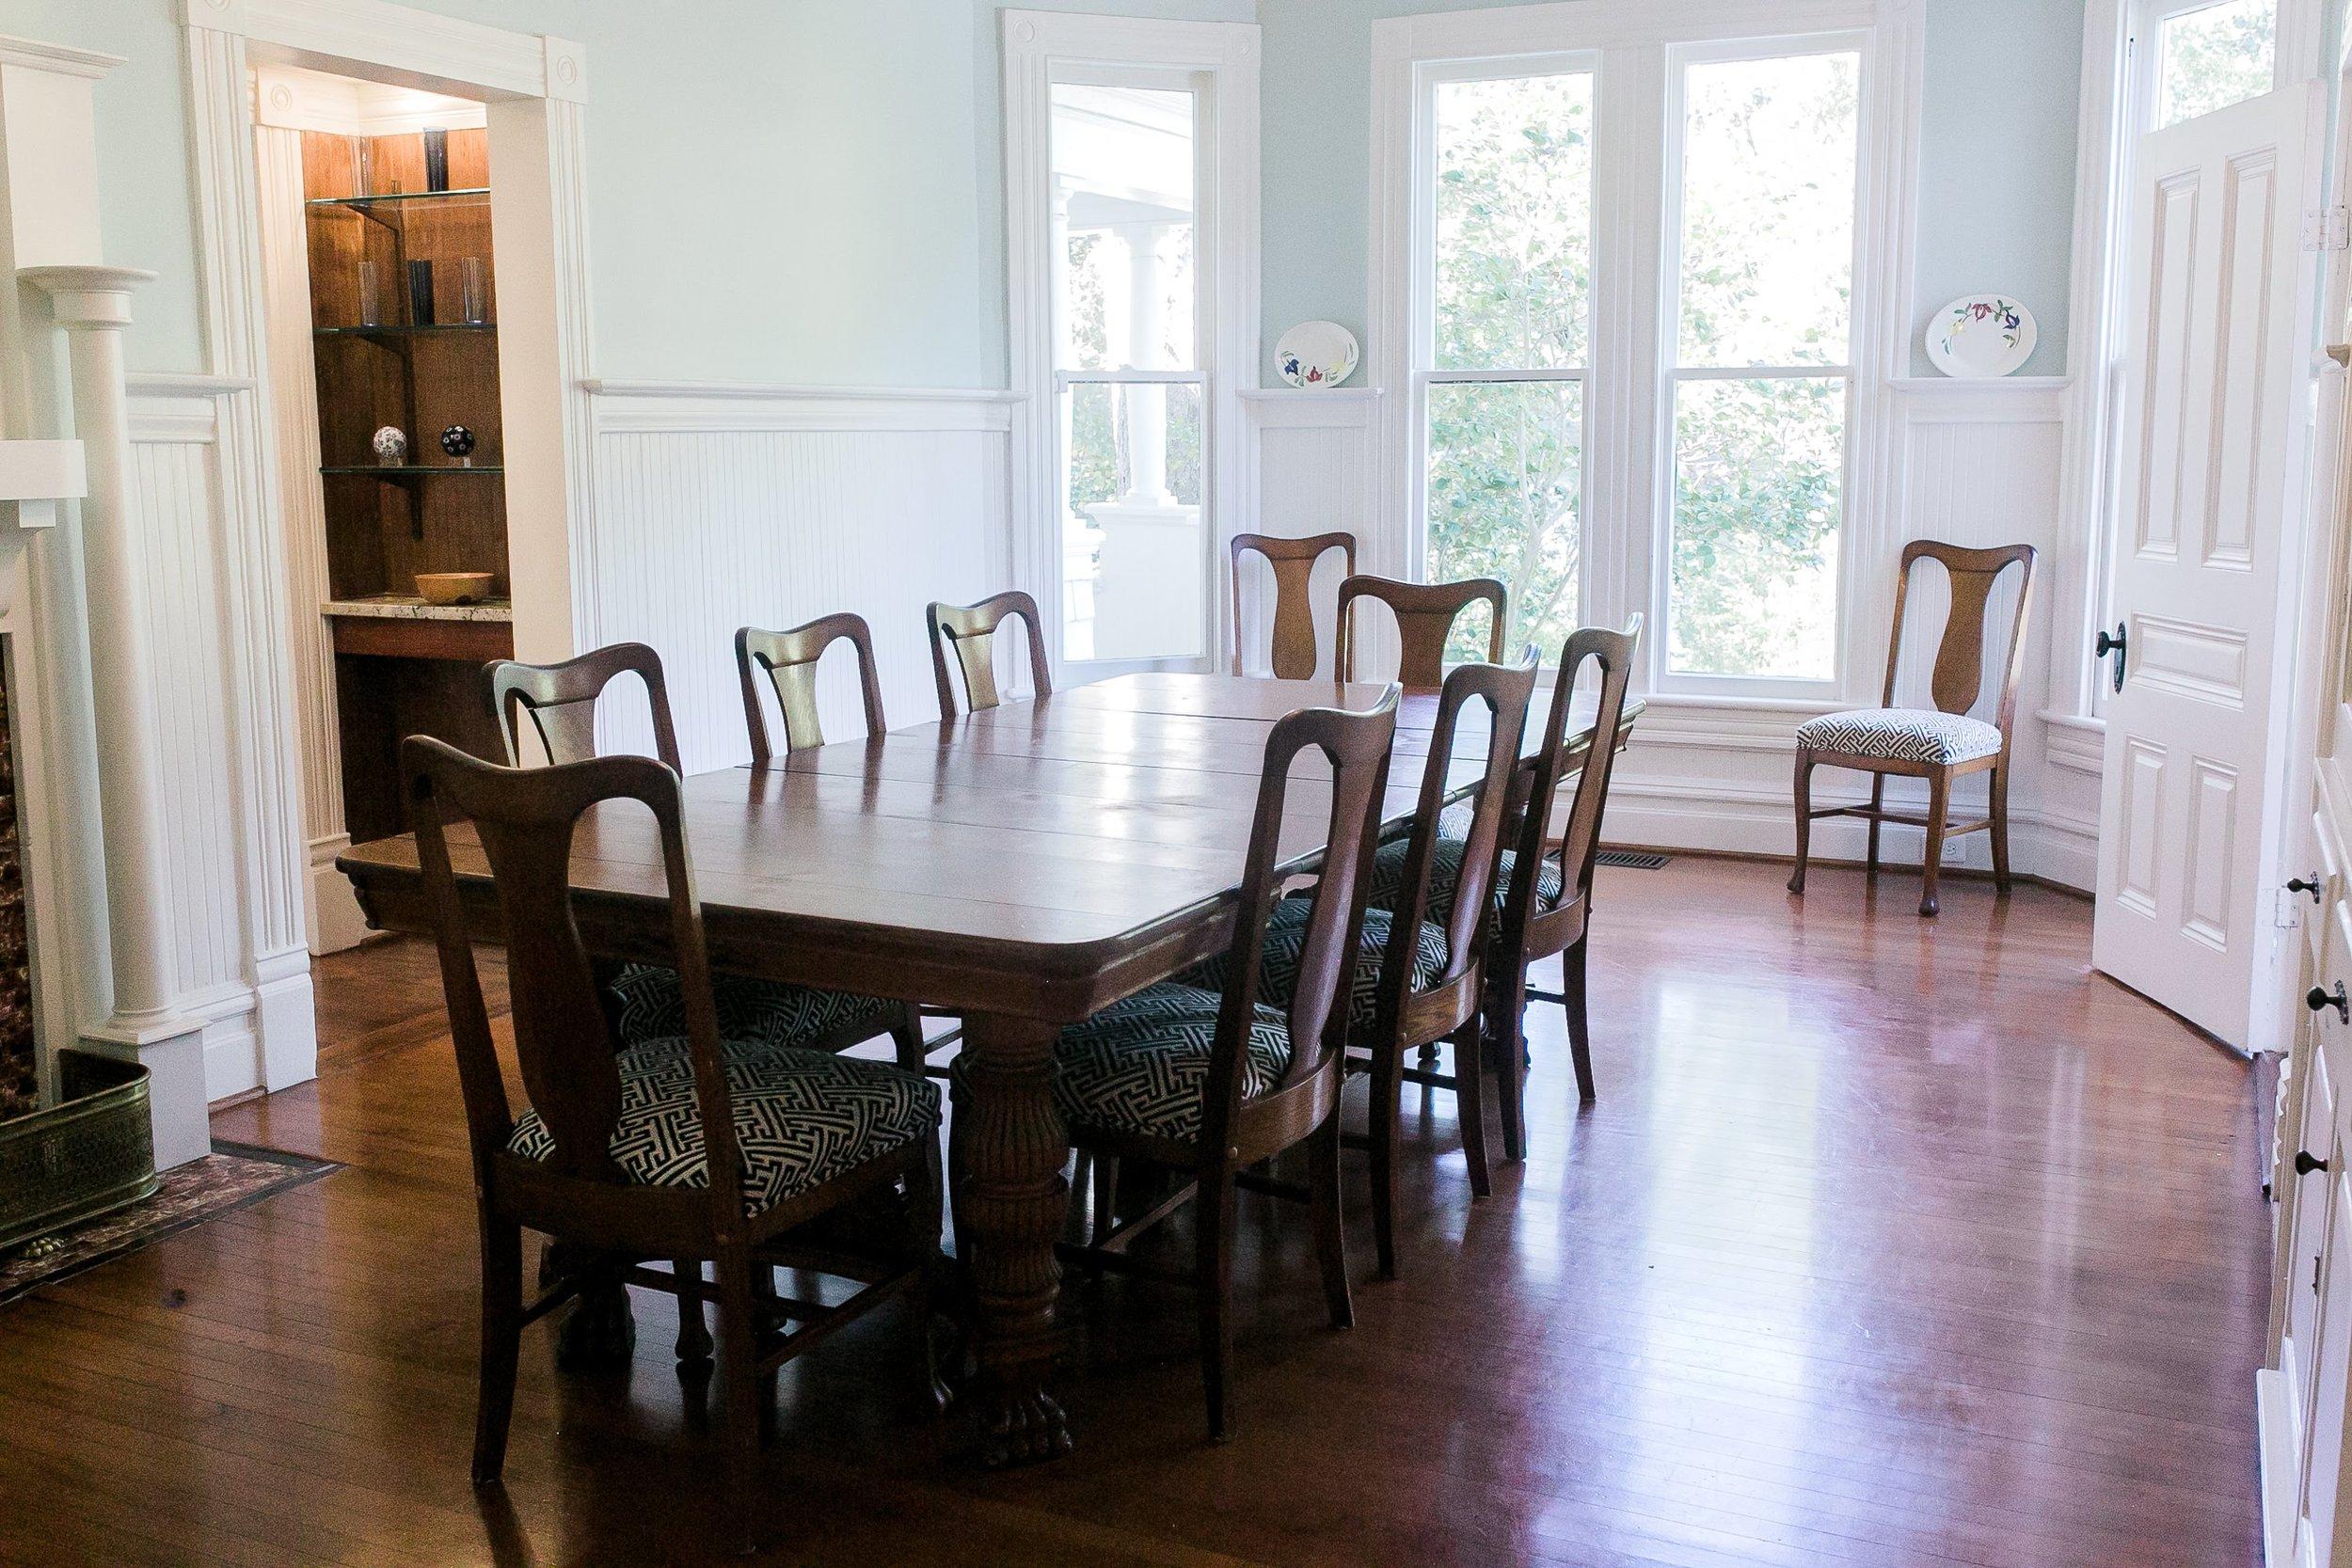 The Formal Dinning Room